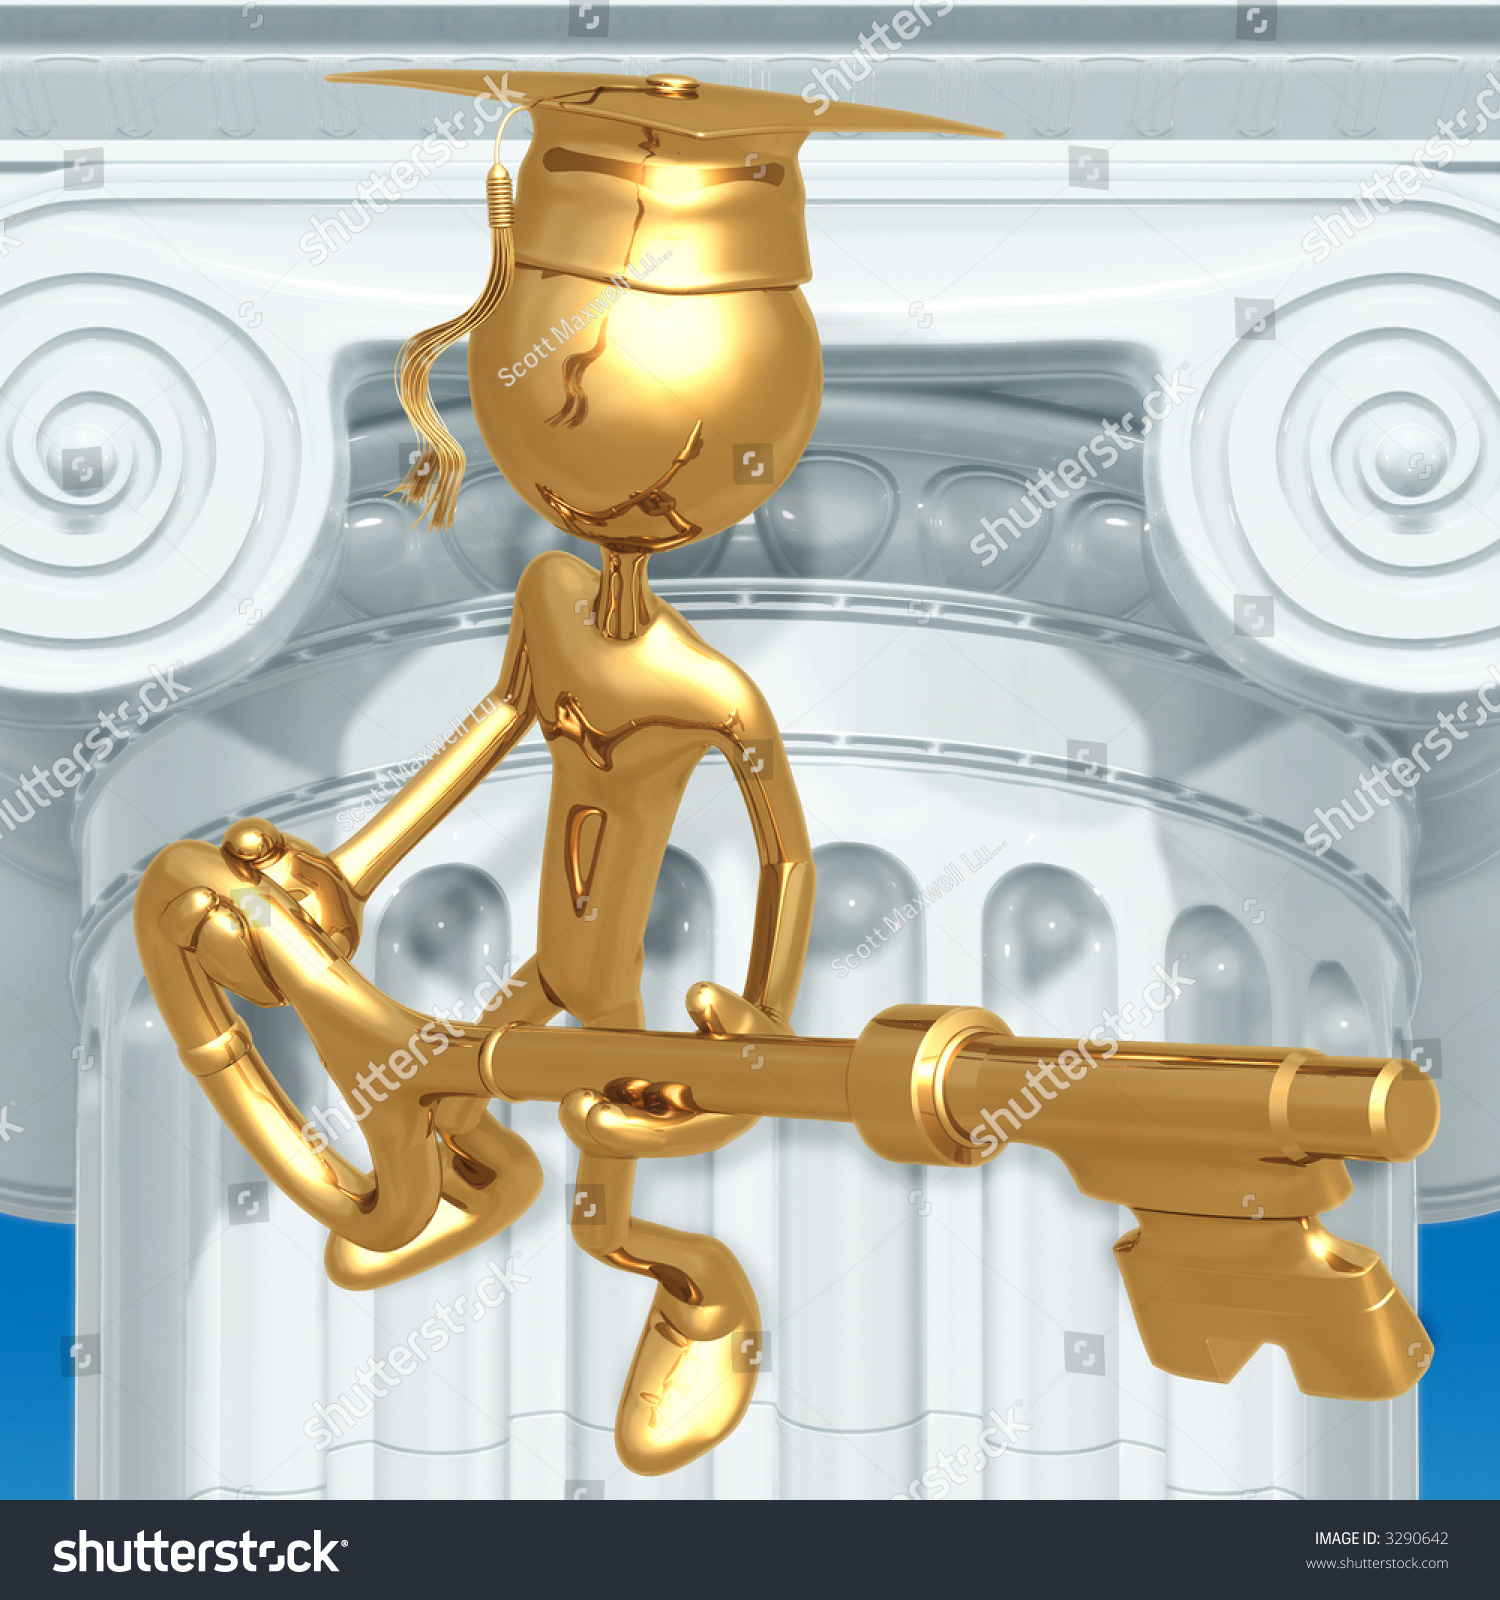 golden grad holding a key graduation concept stock photo 3290642 shutterstock. Black Bedroom Furniture Sets. Home Design Ideas